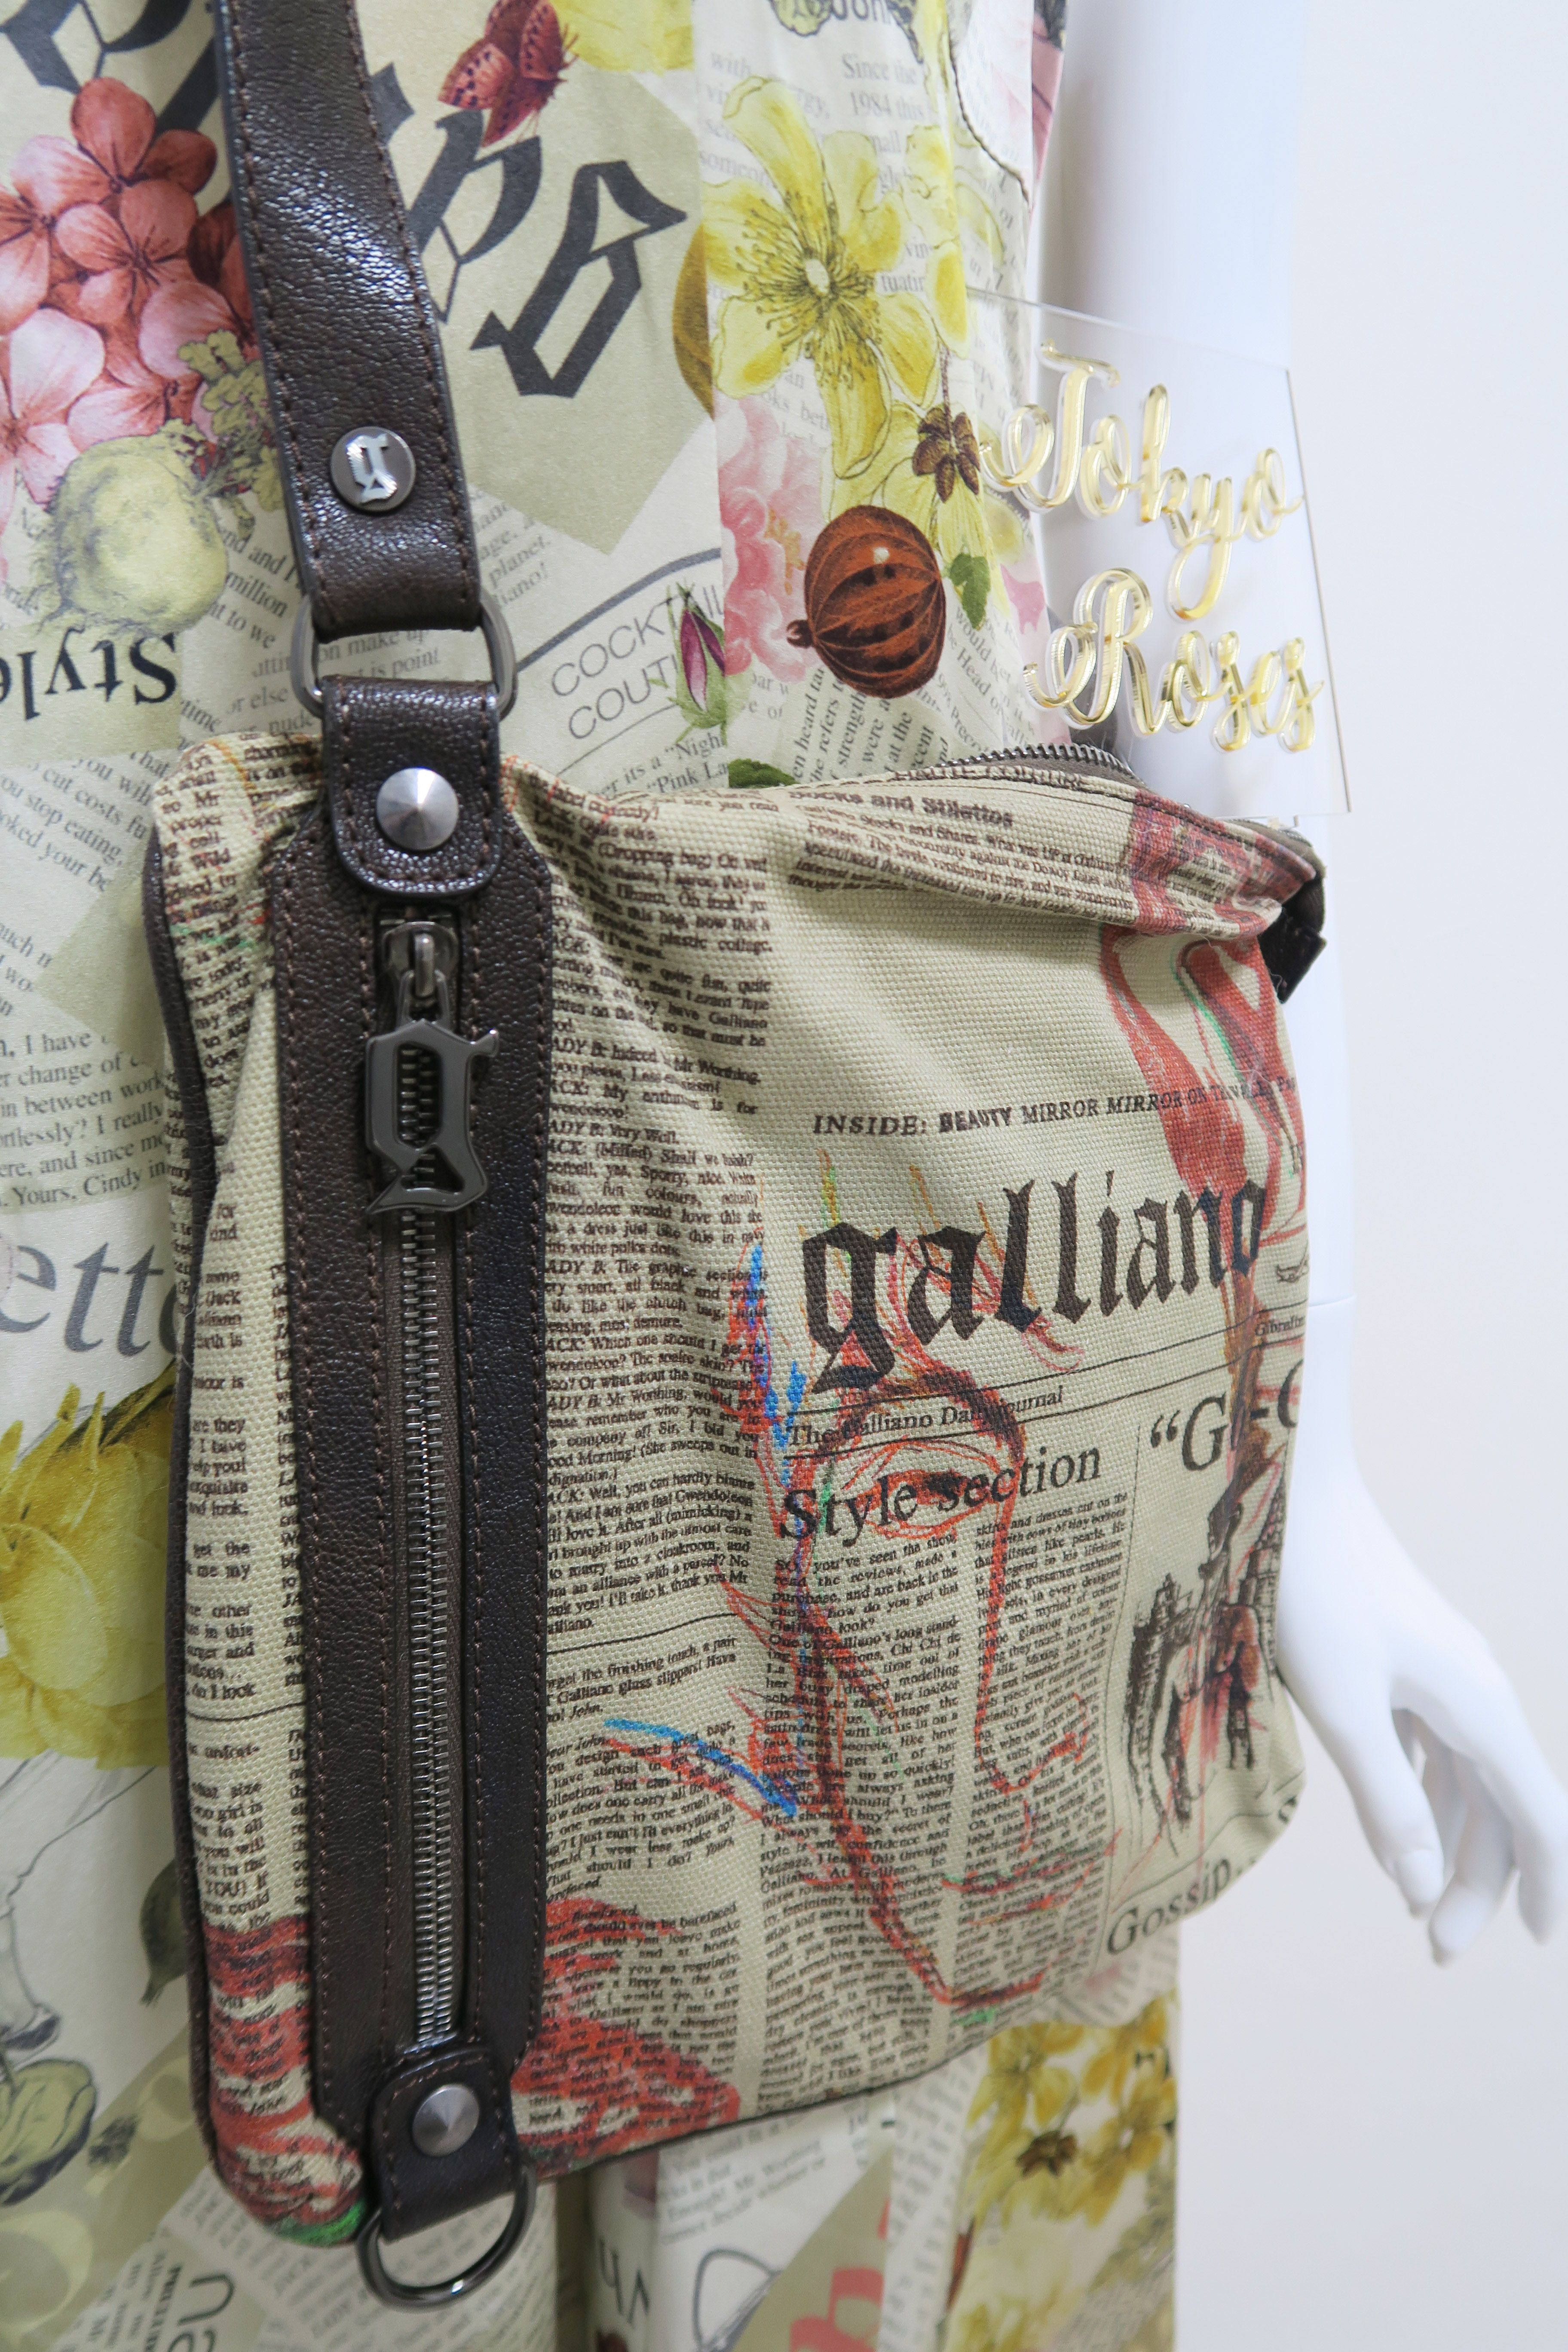 John Galliano Gazette Newspaper Print Crossbody Bag Purse Christian Dior Bags Shoe Necklace Purses And Bags